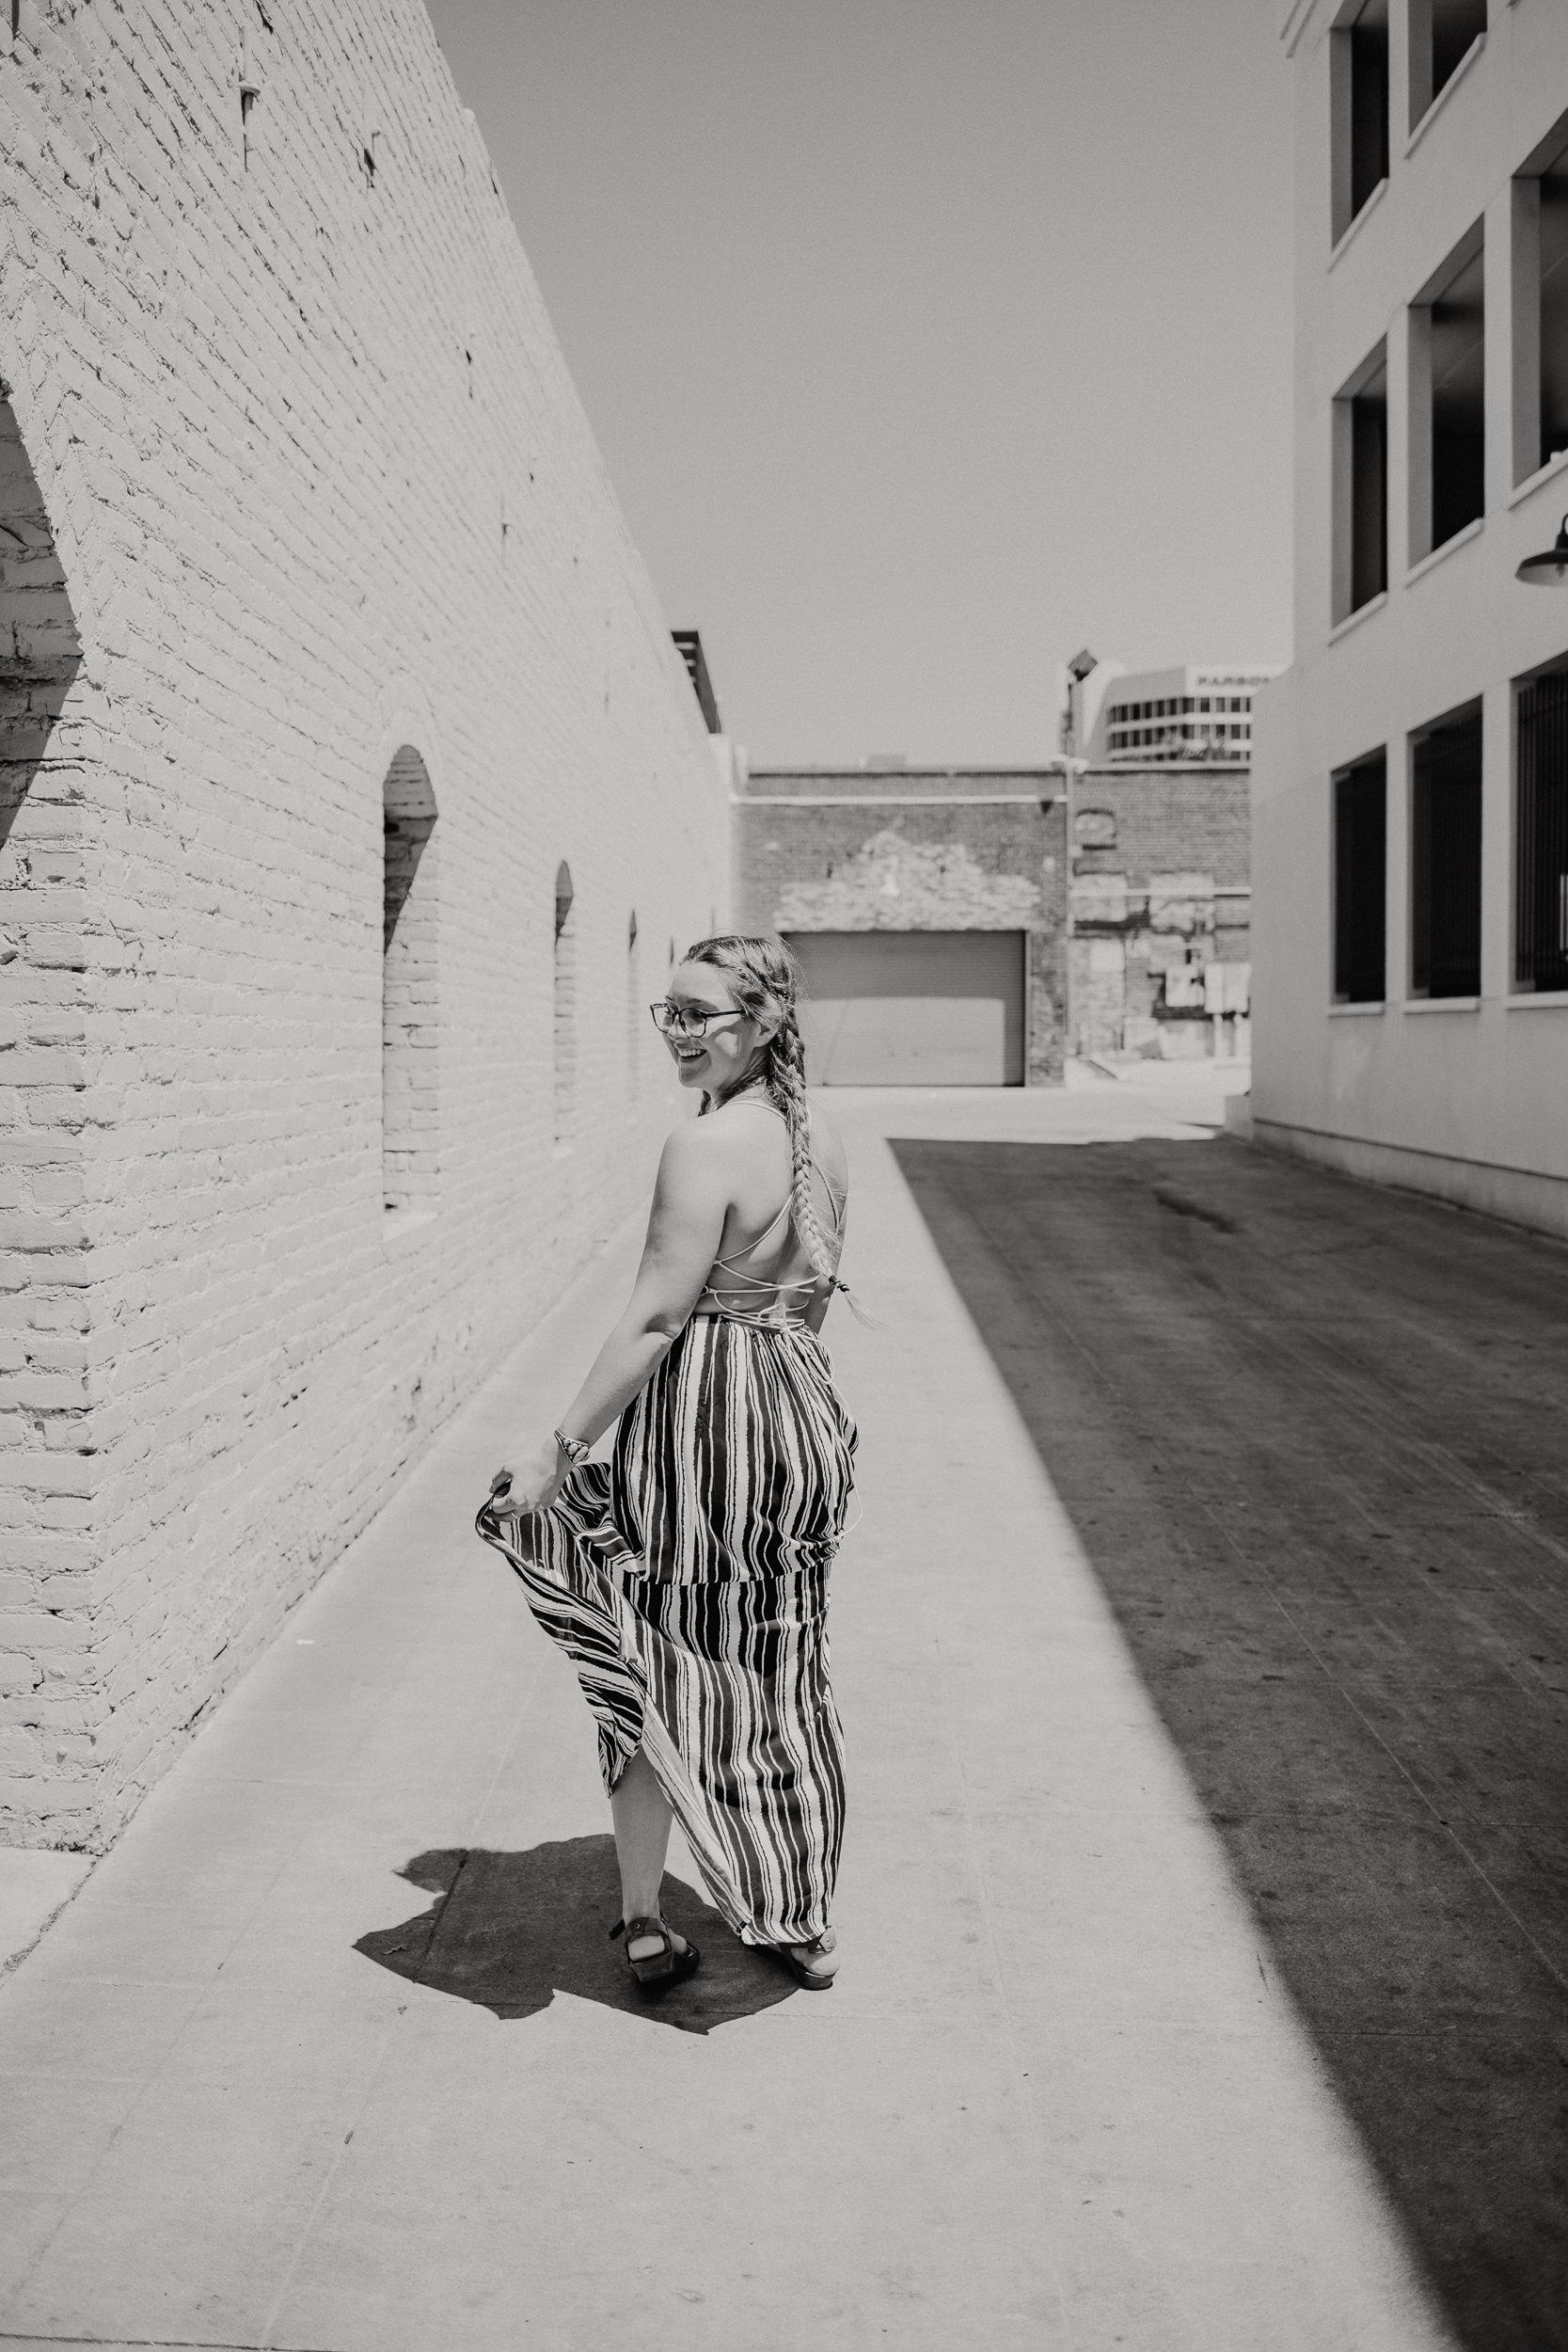 sPortraits of Me by Crystal-18.jpg